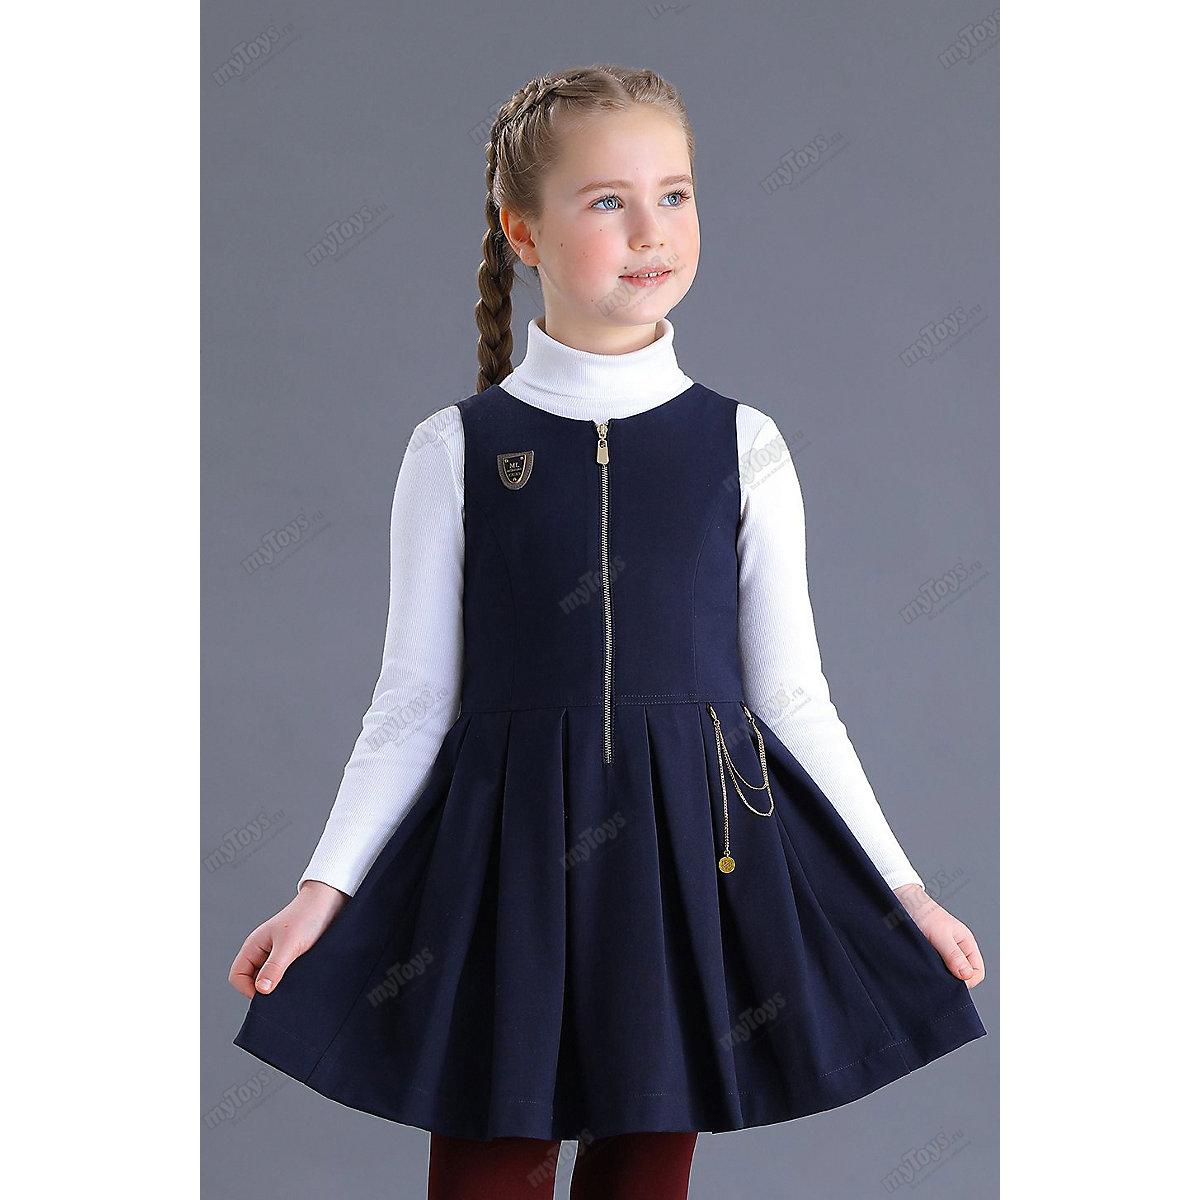 МАЛЕНЬКАЯ ЛЕДИ Dresses 11686286 school uniform dark blue for girls Formal Sleeveless Pleat blue backless design stitching v neck sleeveless sexy dress